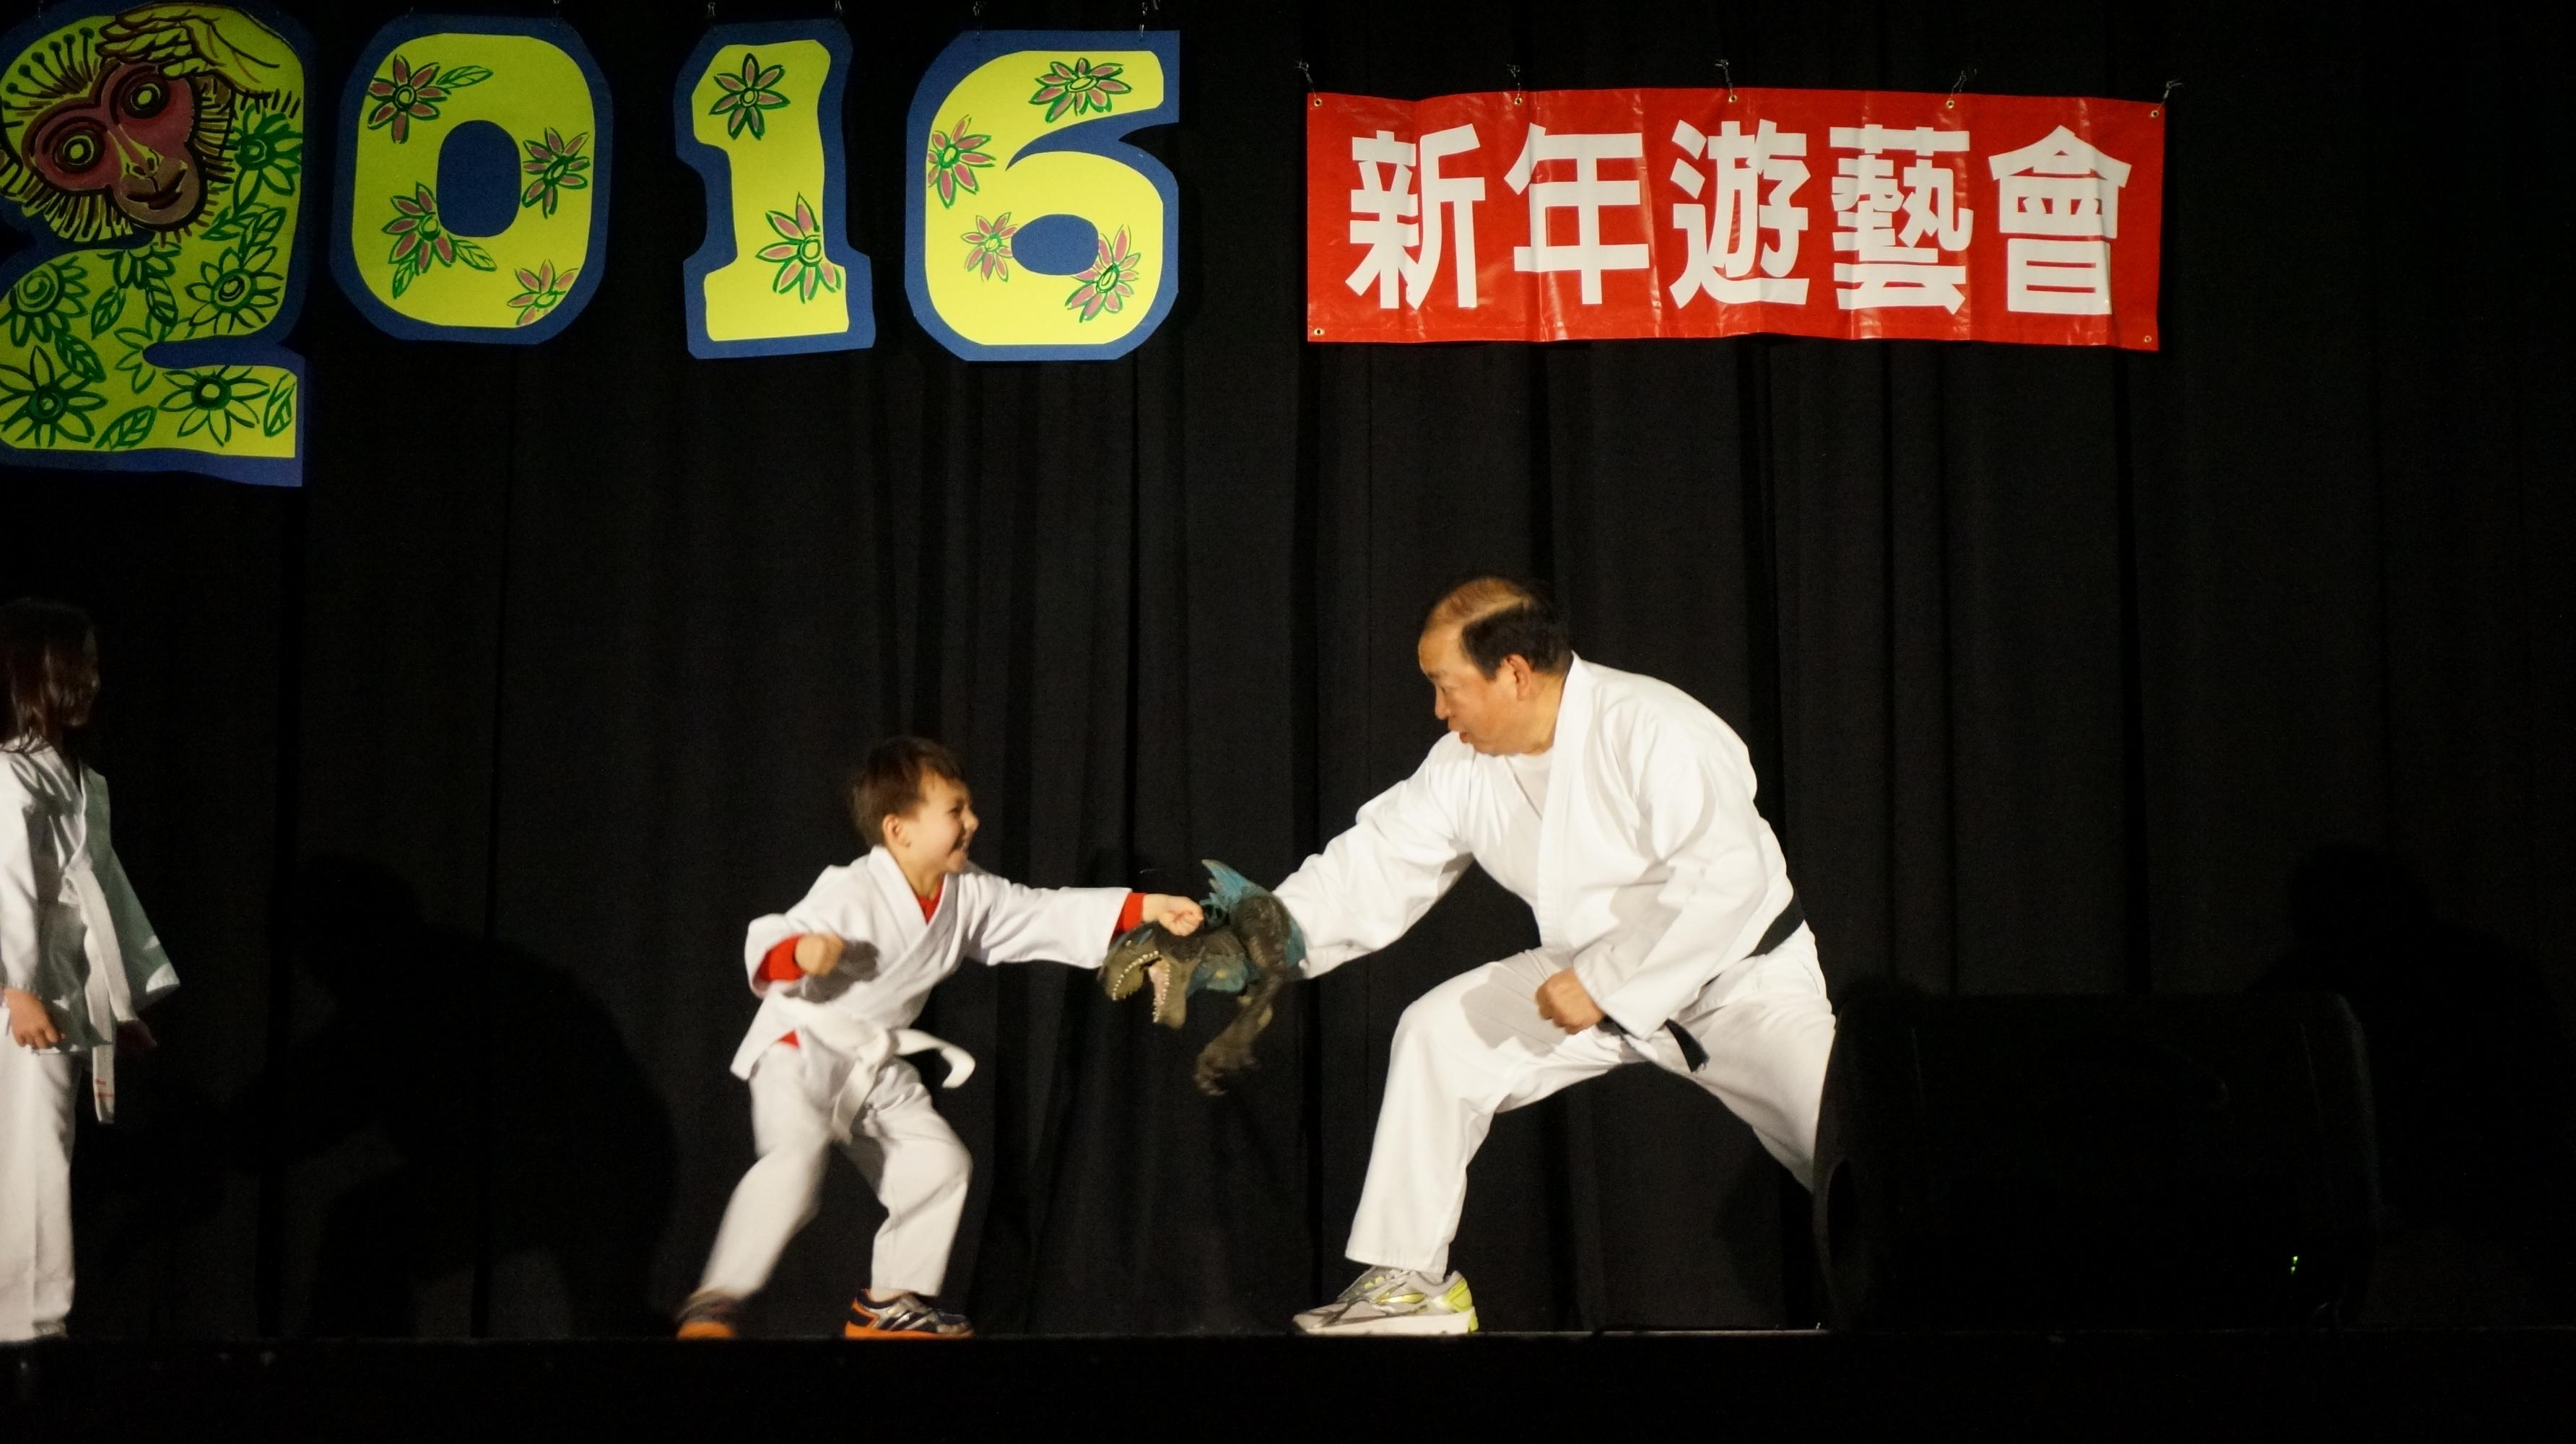 b3866c1b697d0b9eb7e6_aaa_Chinese_New_Year_pix_339.JPG